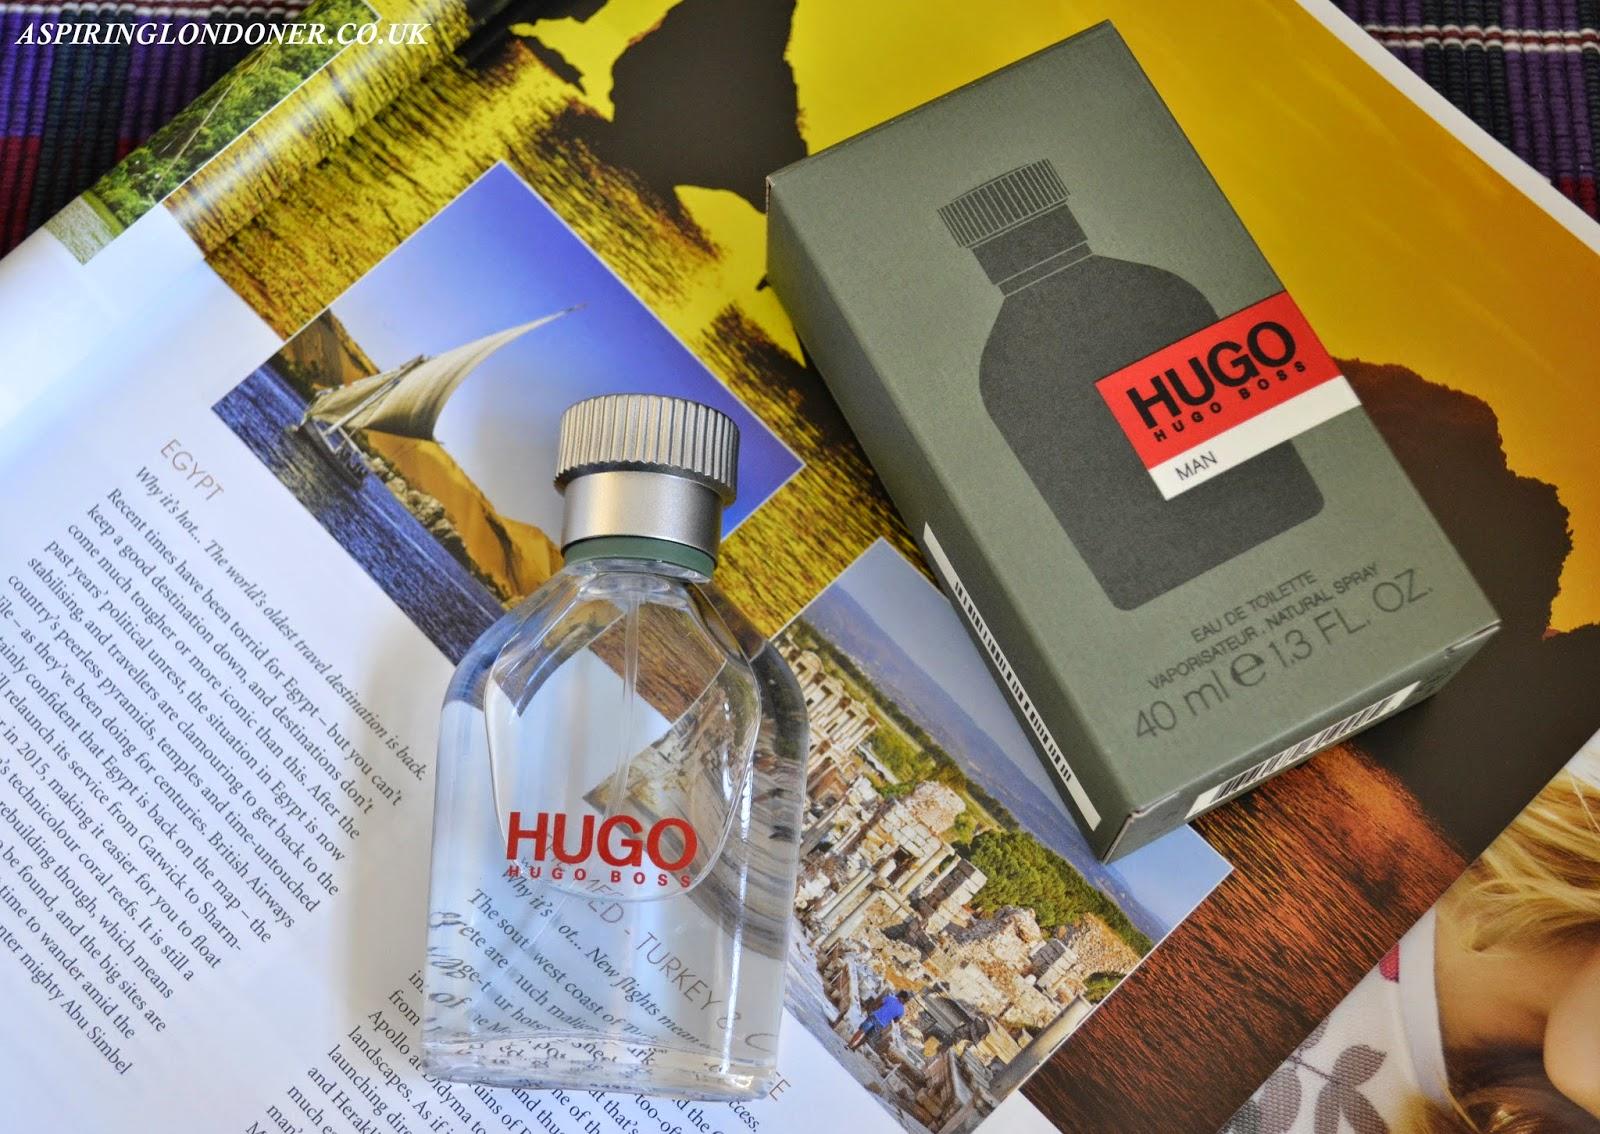 Valentine's Day Hugo Man EDT Perfume Review - Aspiring Londoner